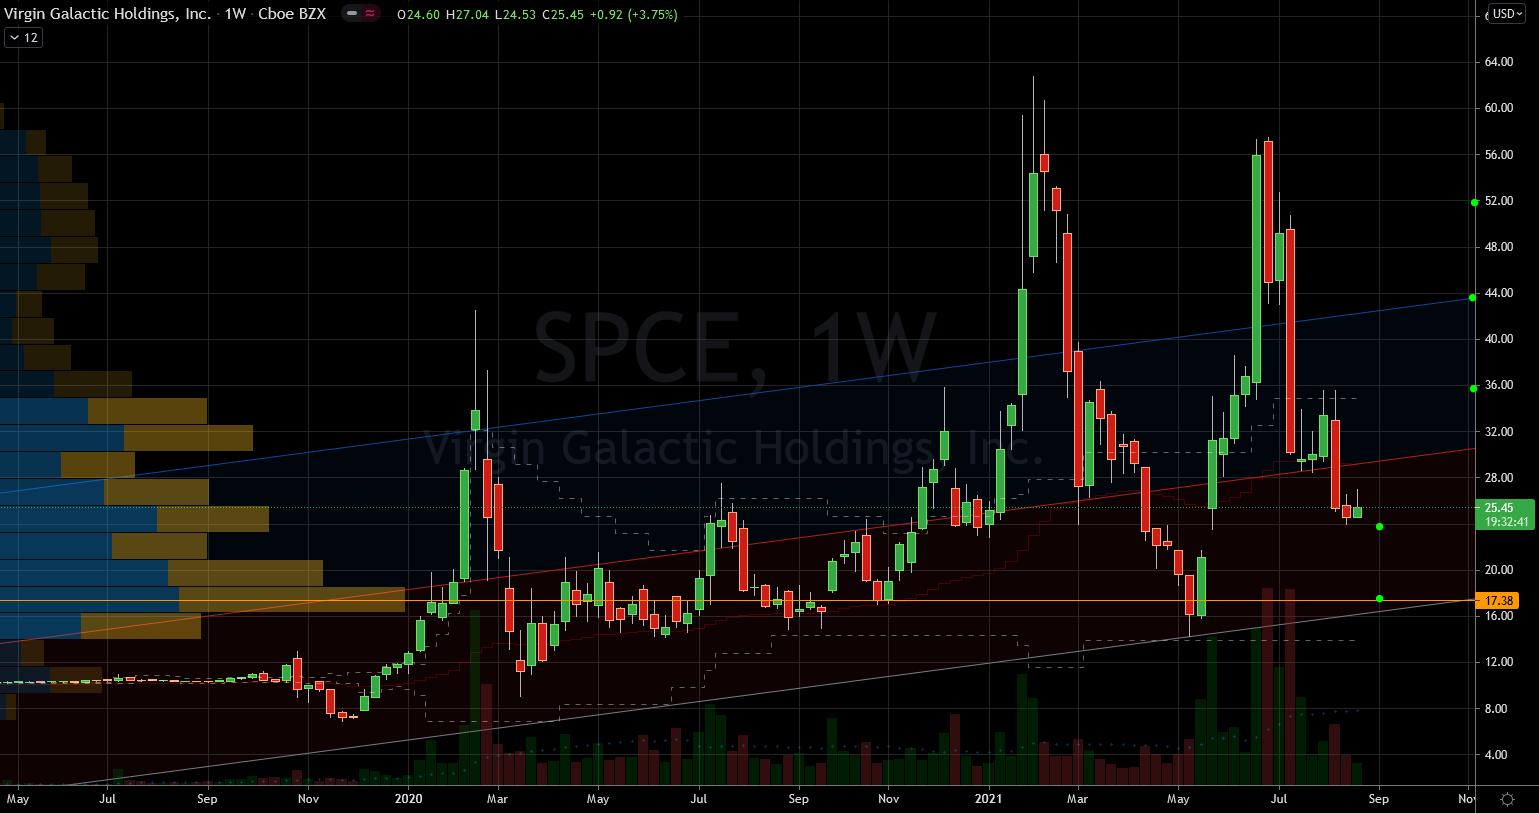 Virgin Galactic (SPCE) Stock Chart Showing Reasonable Levels